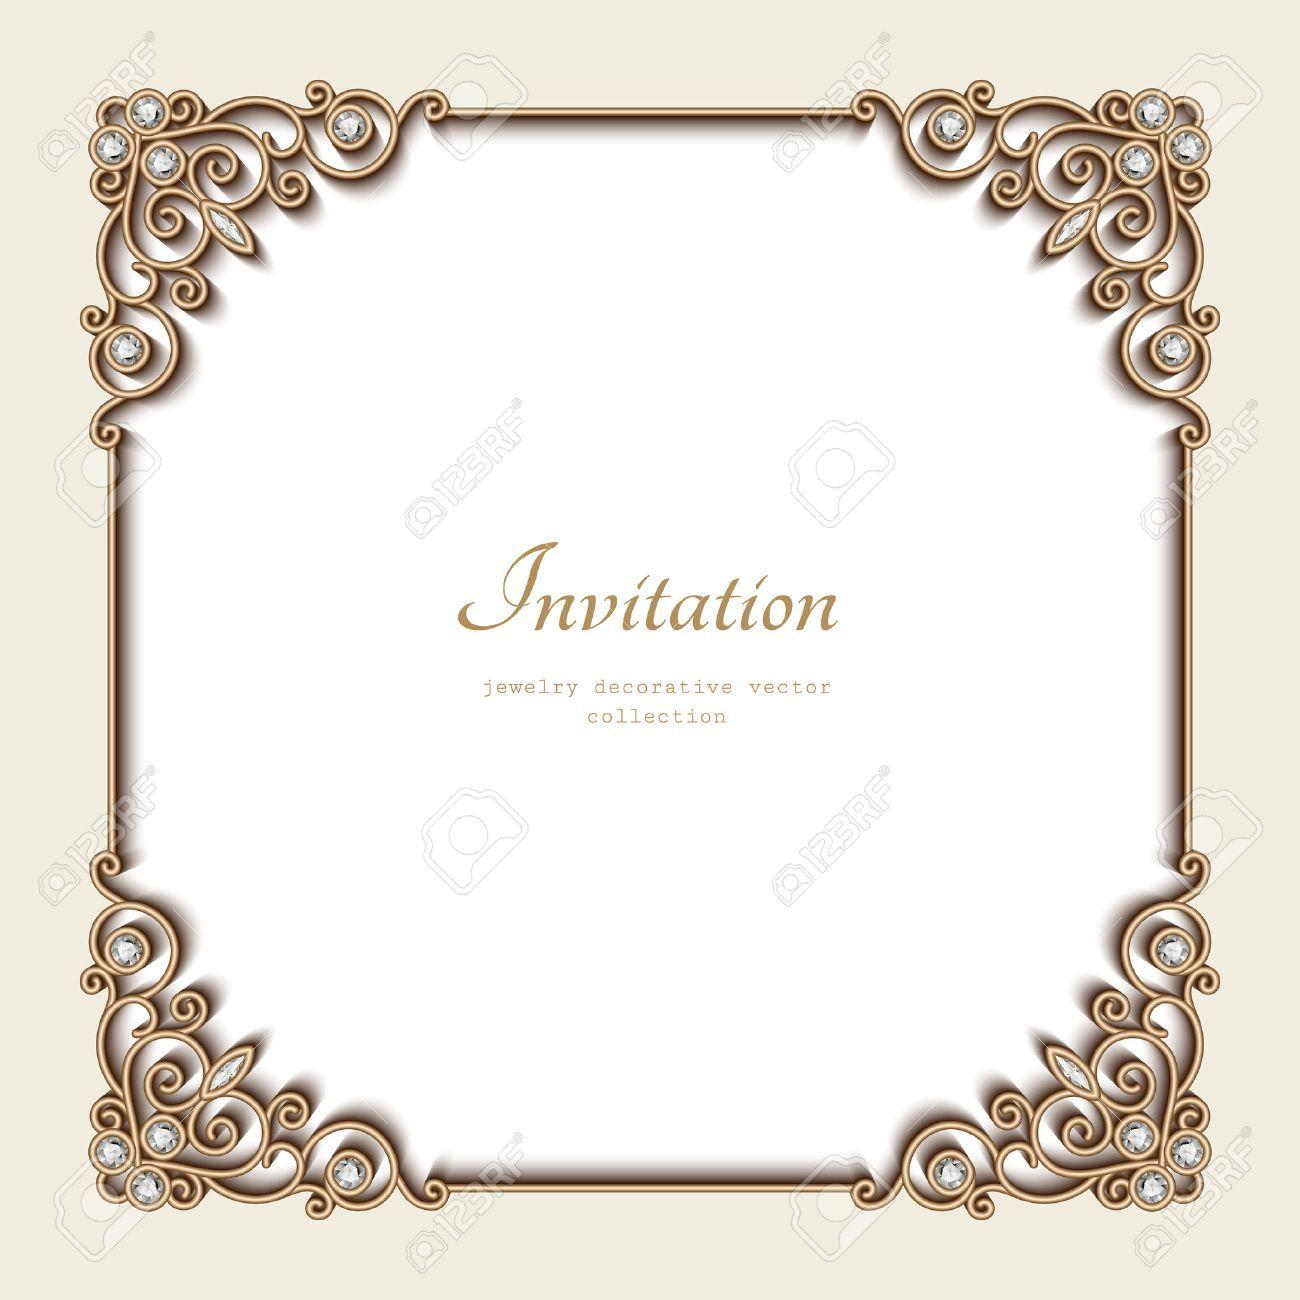 Vintage gold background, elegant square frame, invitation template, antique jewelry vignette , #ad, #elegant, #square, #background, #Vintage, #gold